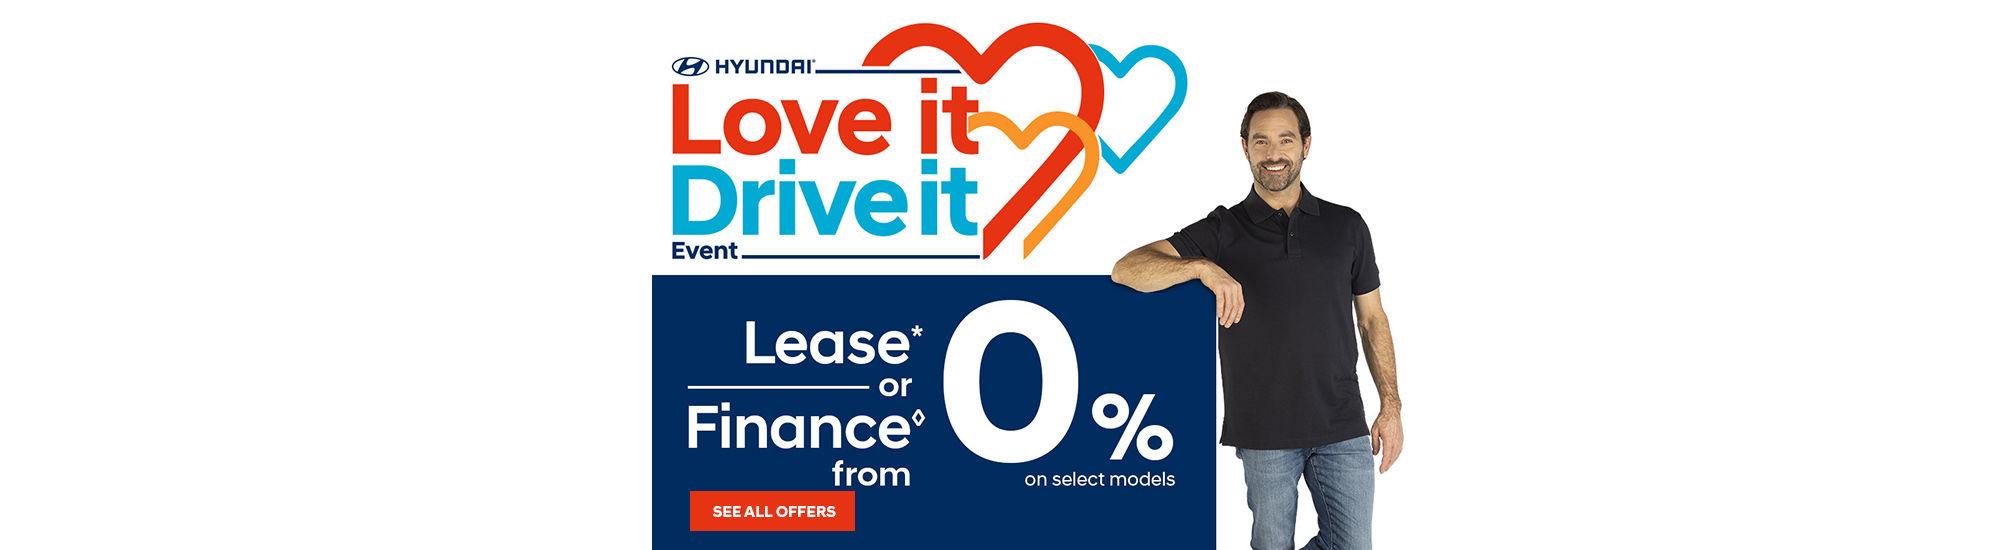 Hyundai LOVE IT DRIVE IT Event